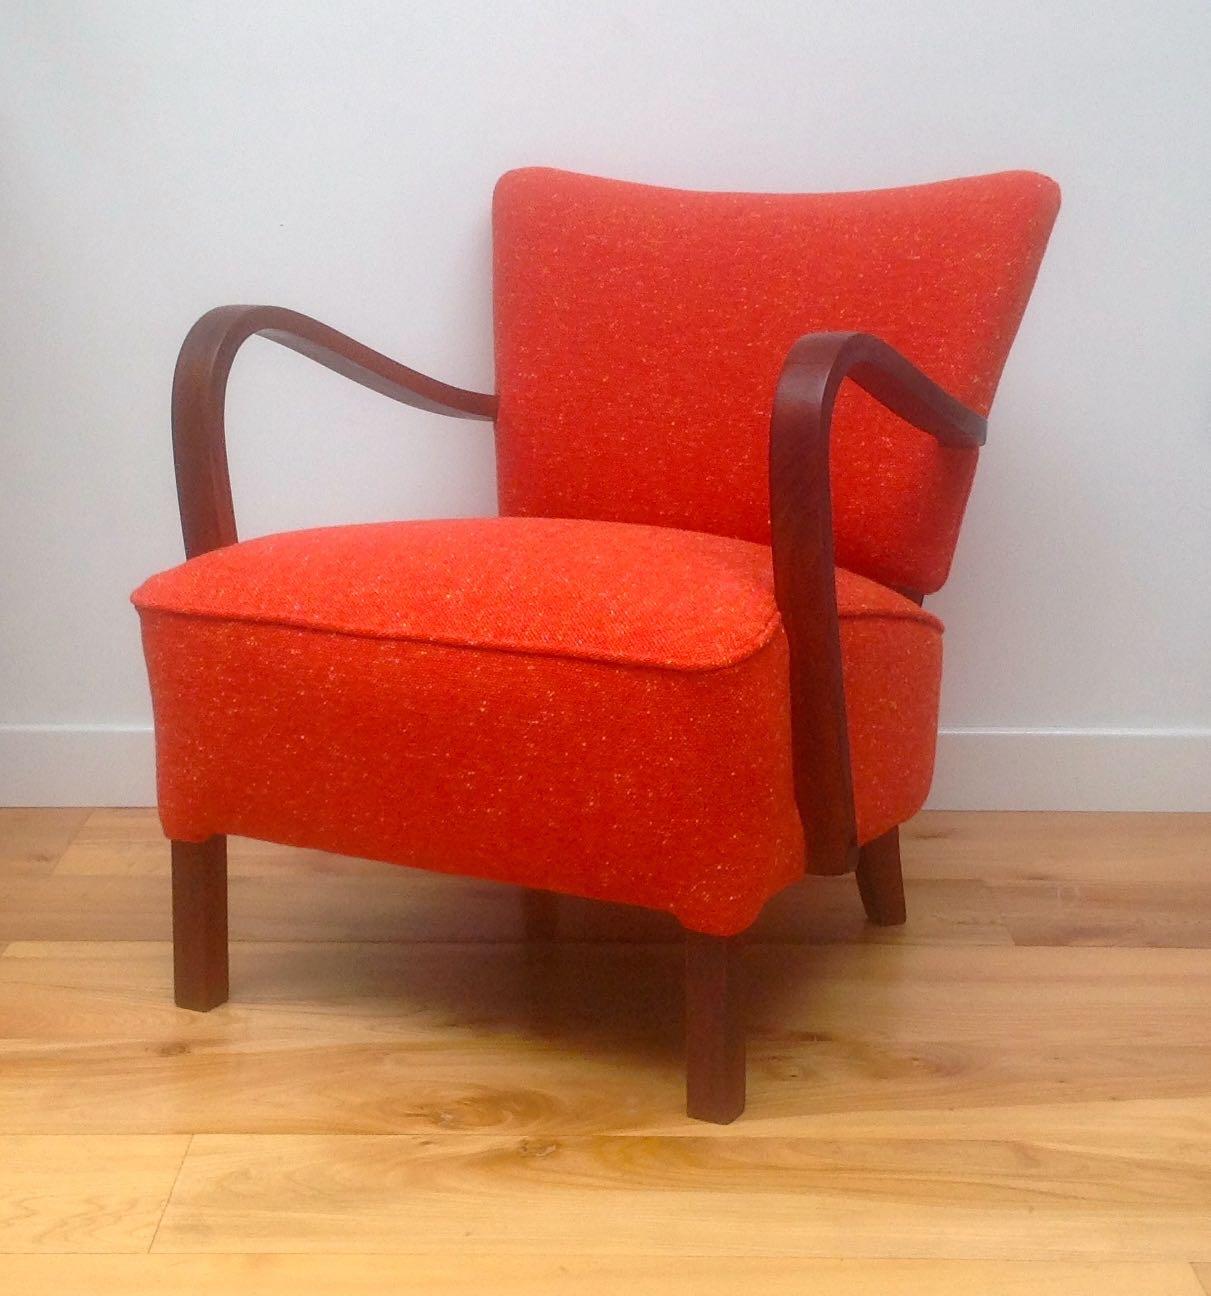 Vintage 1930s Deco Armchair - Orange Tweed - Maud ...